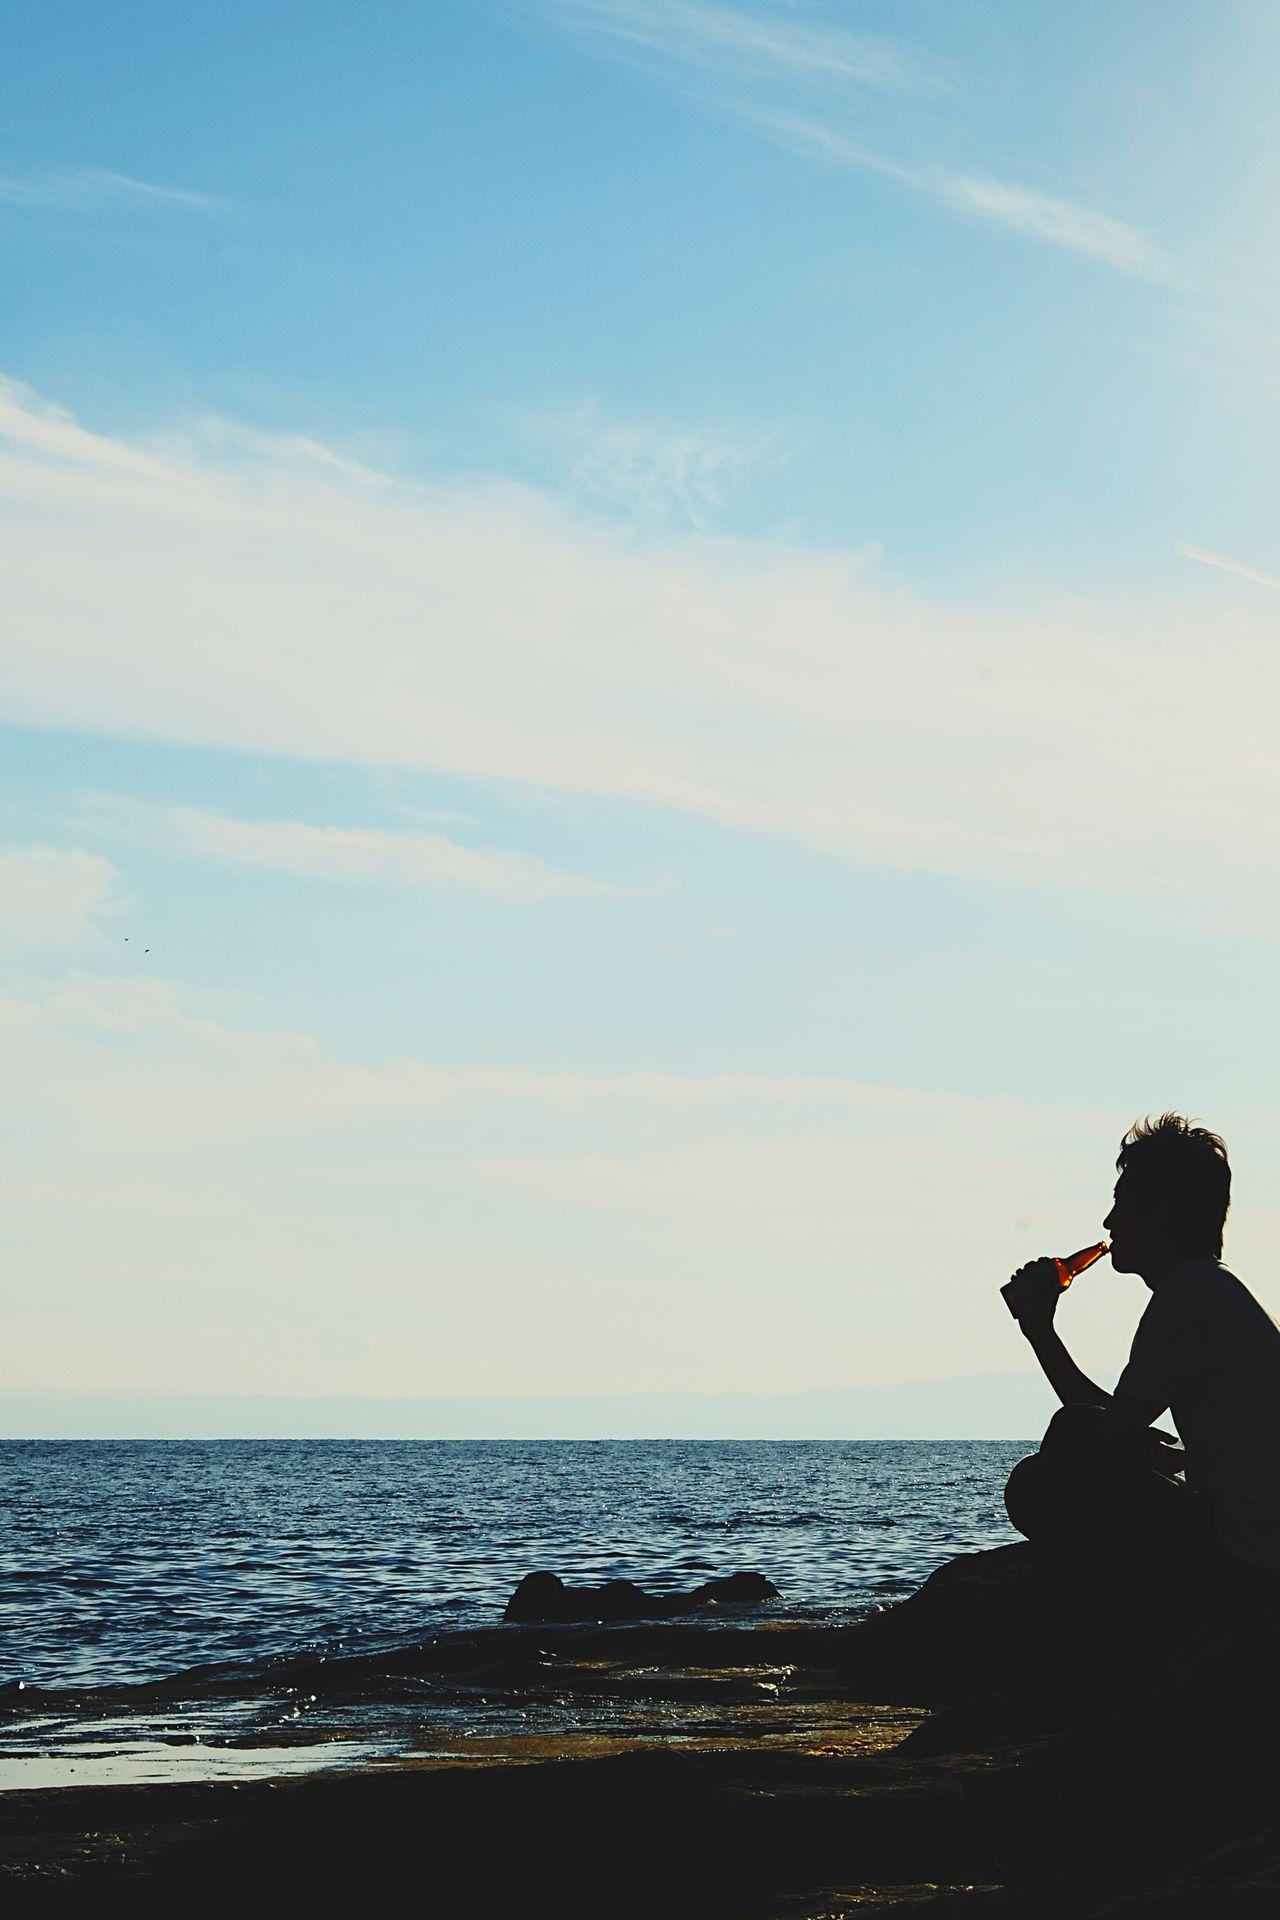 Enjoy solitude Sea Horizon Over Water Sky Lifestyles Enjoying Life Enjoying The Sun Enjoying The View Enjoy Enjoyment Scenics Beauty In Nature Water Beach Cloud - Sky Ocean Oceanside Drinks Drink Drinking Beverage Silhouette Silhouette_collection Beer Beer Time